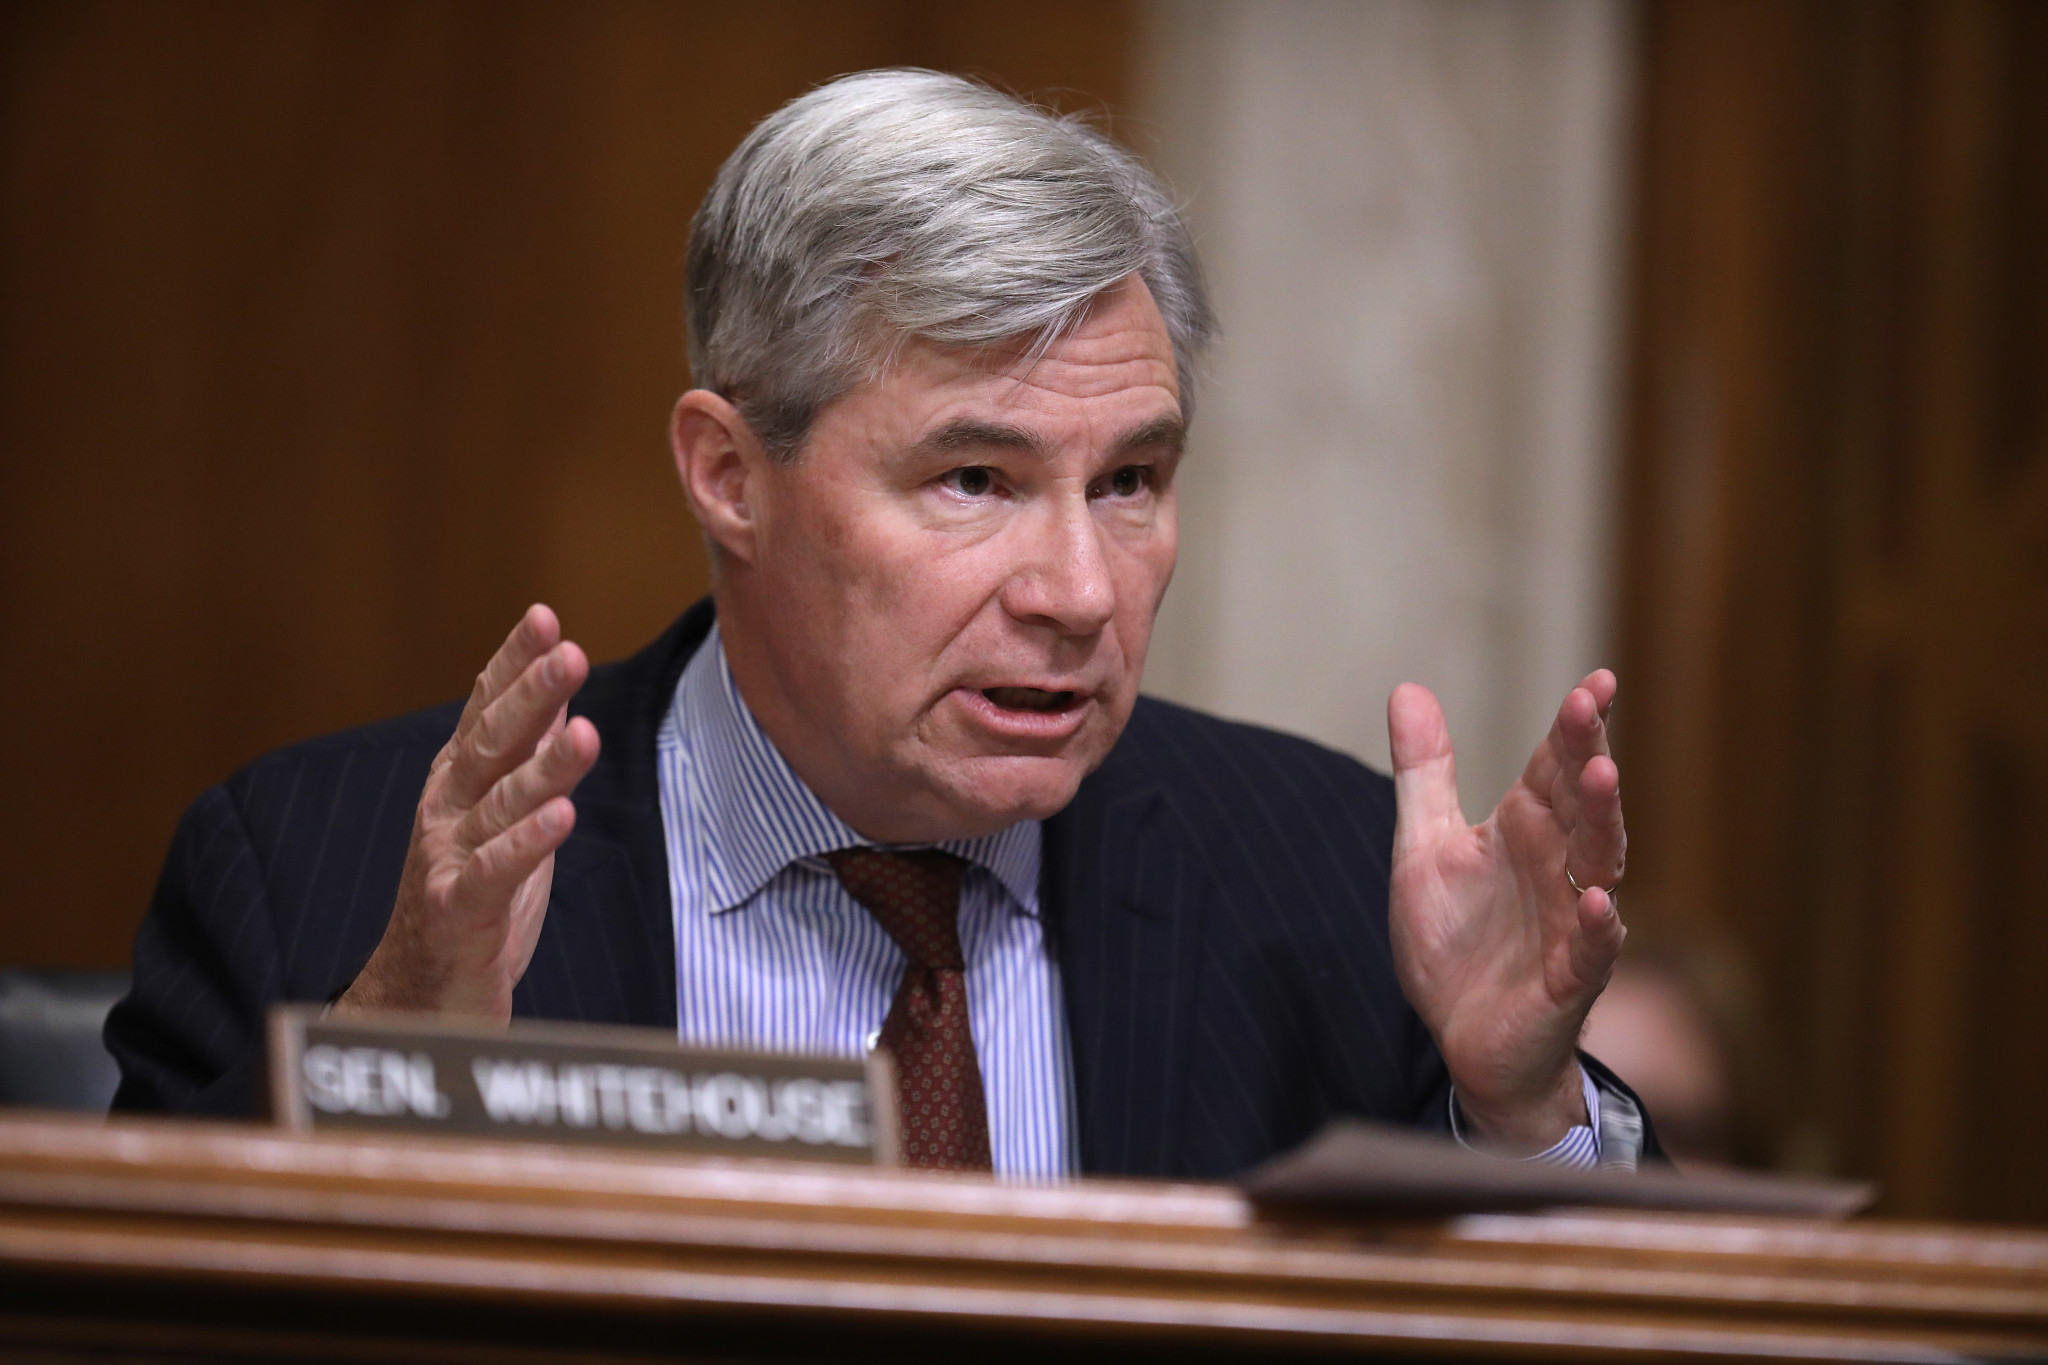 Senator Sheldon Whitehouse helped introduce the Rodchenkov Act ©Getty Images